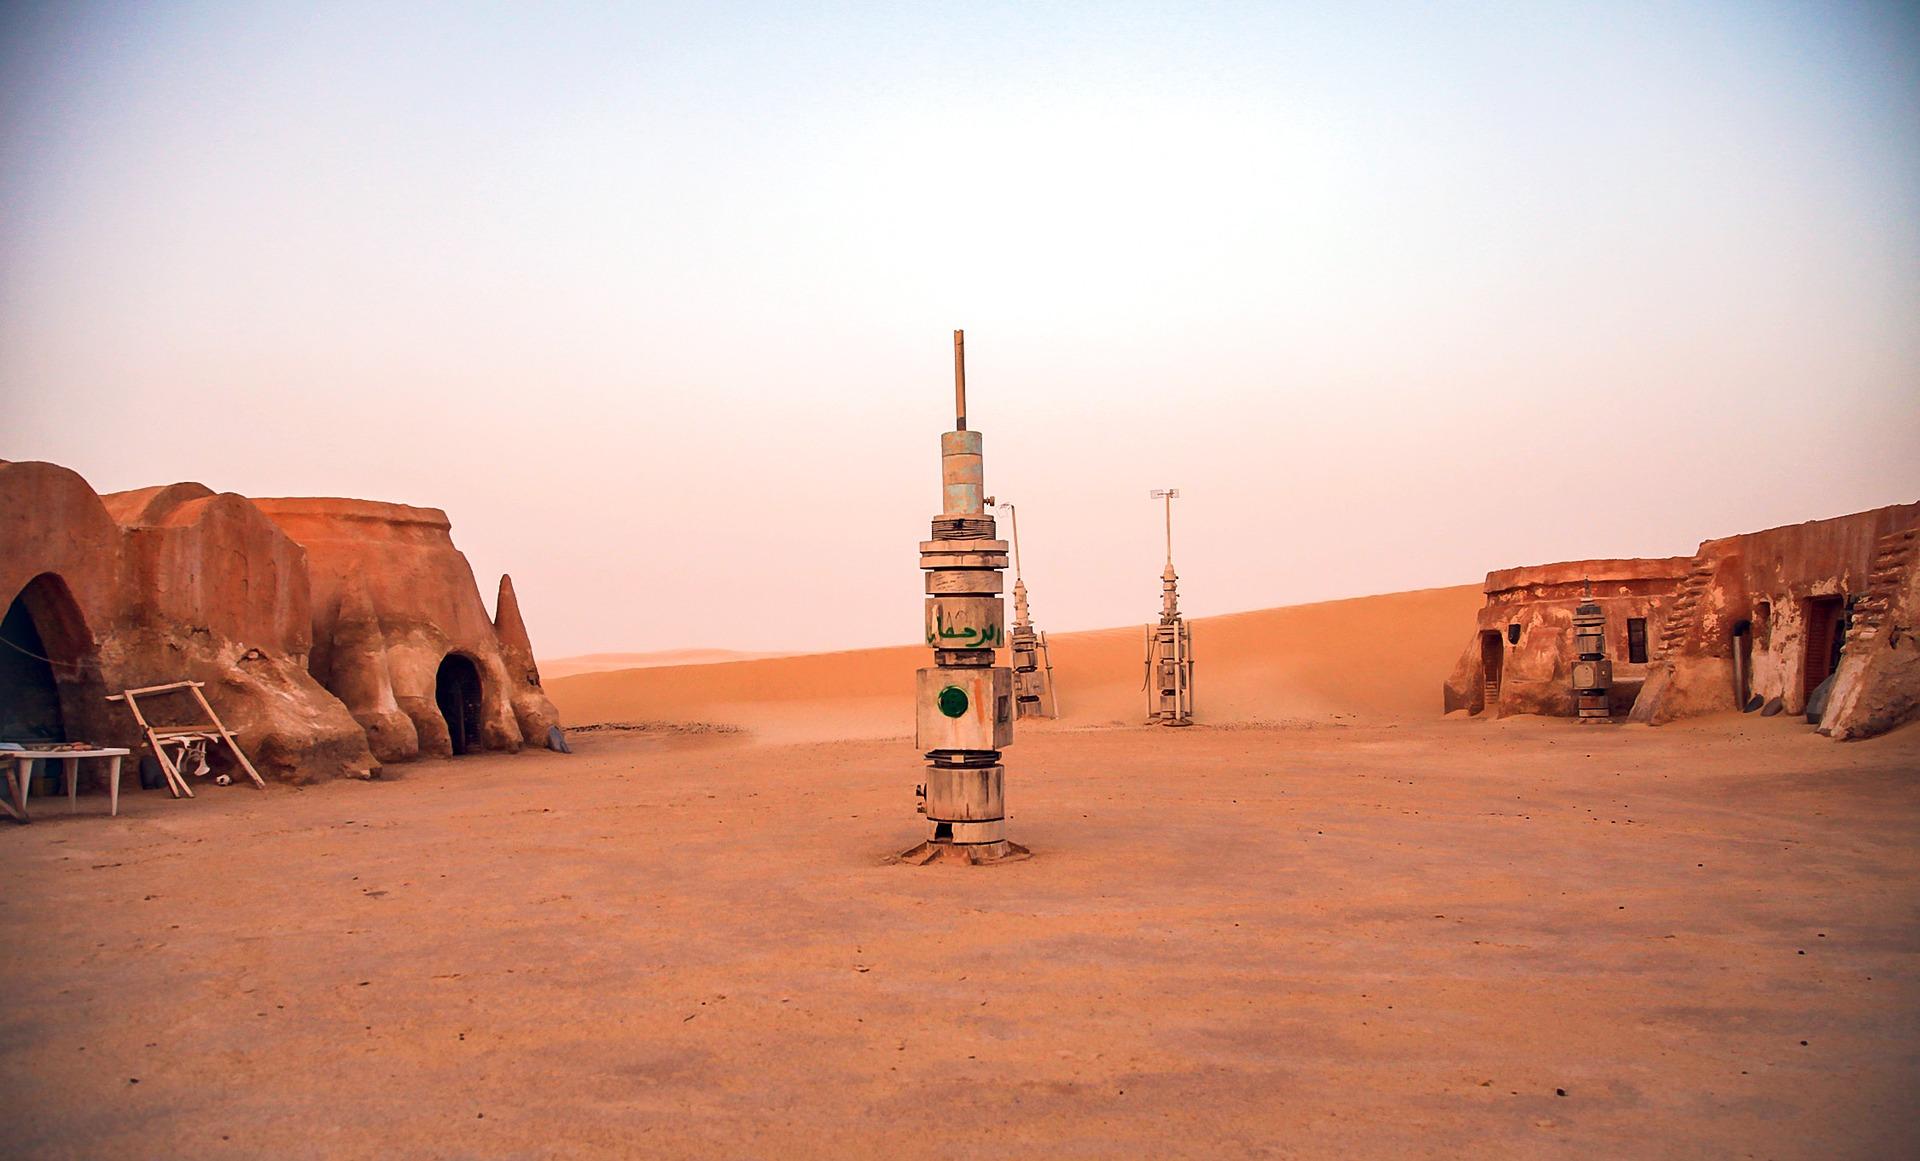 Star Wars Alderaan